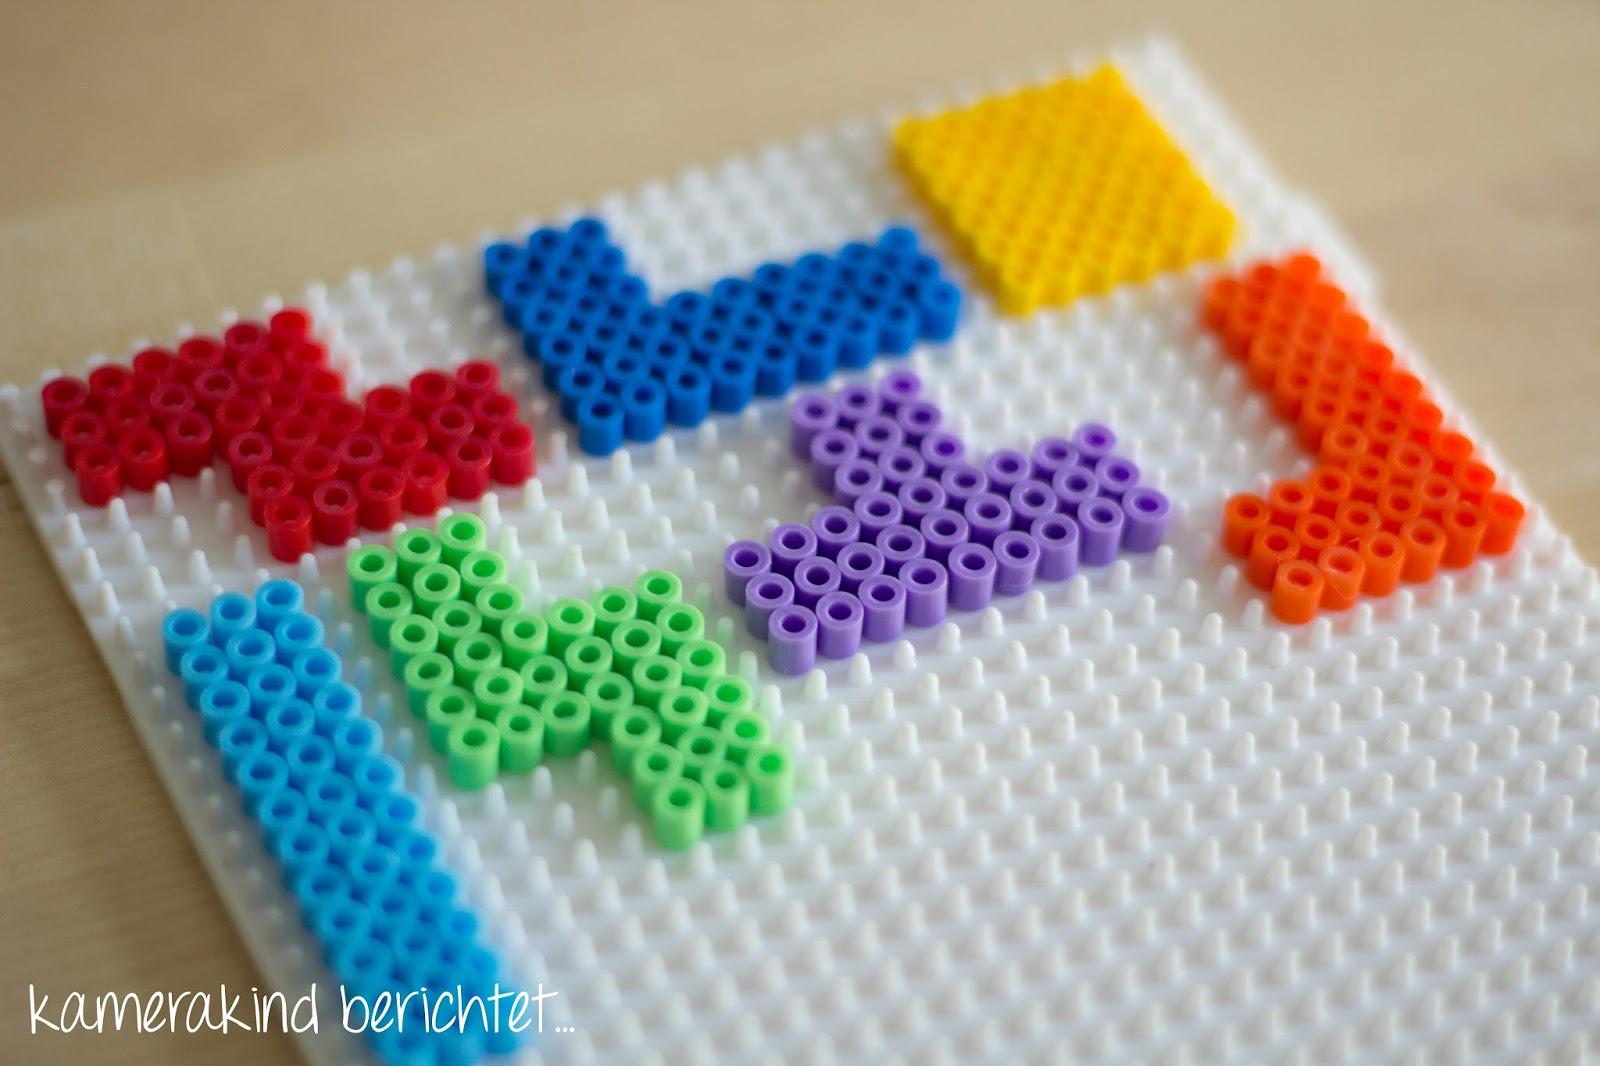 Bügelperlen zu Tetrisformen stecken